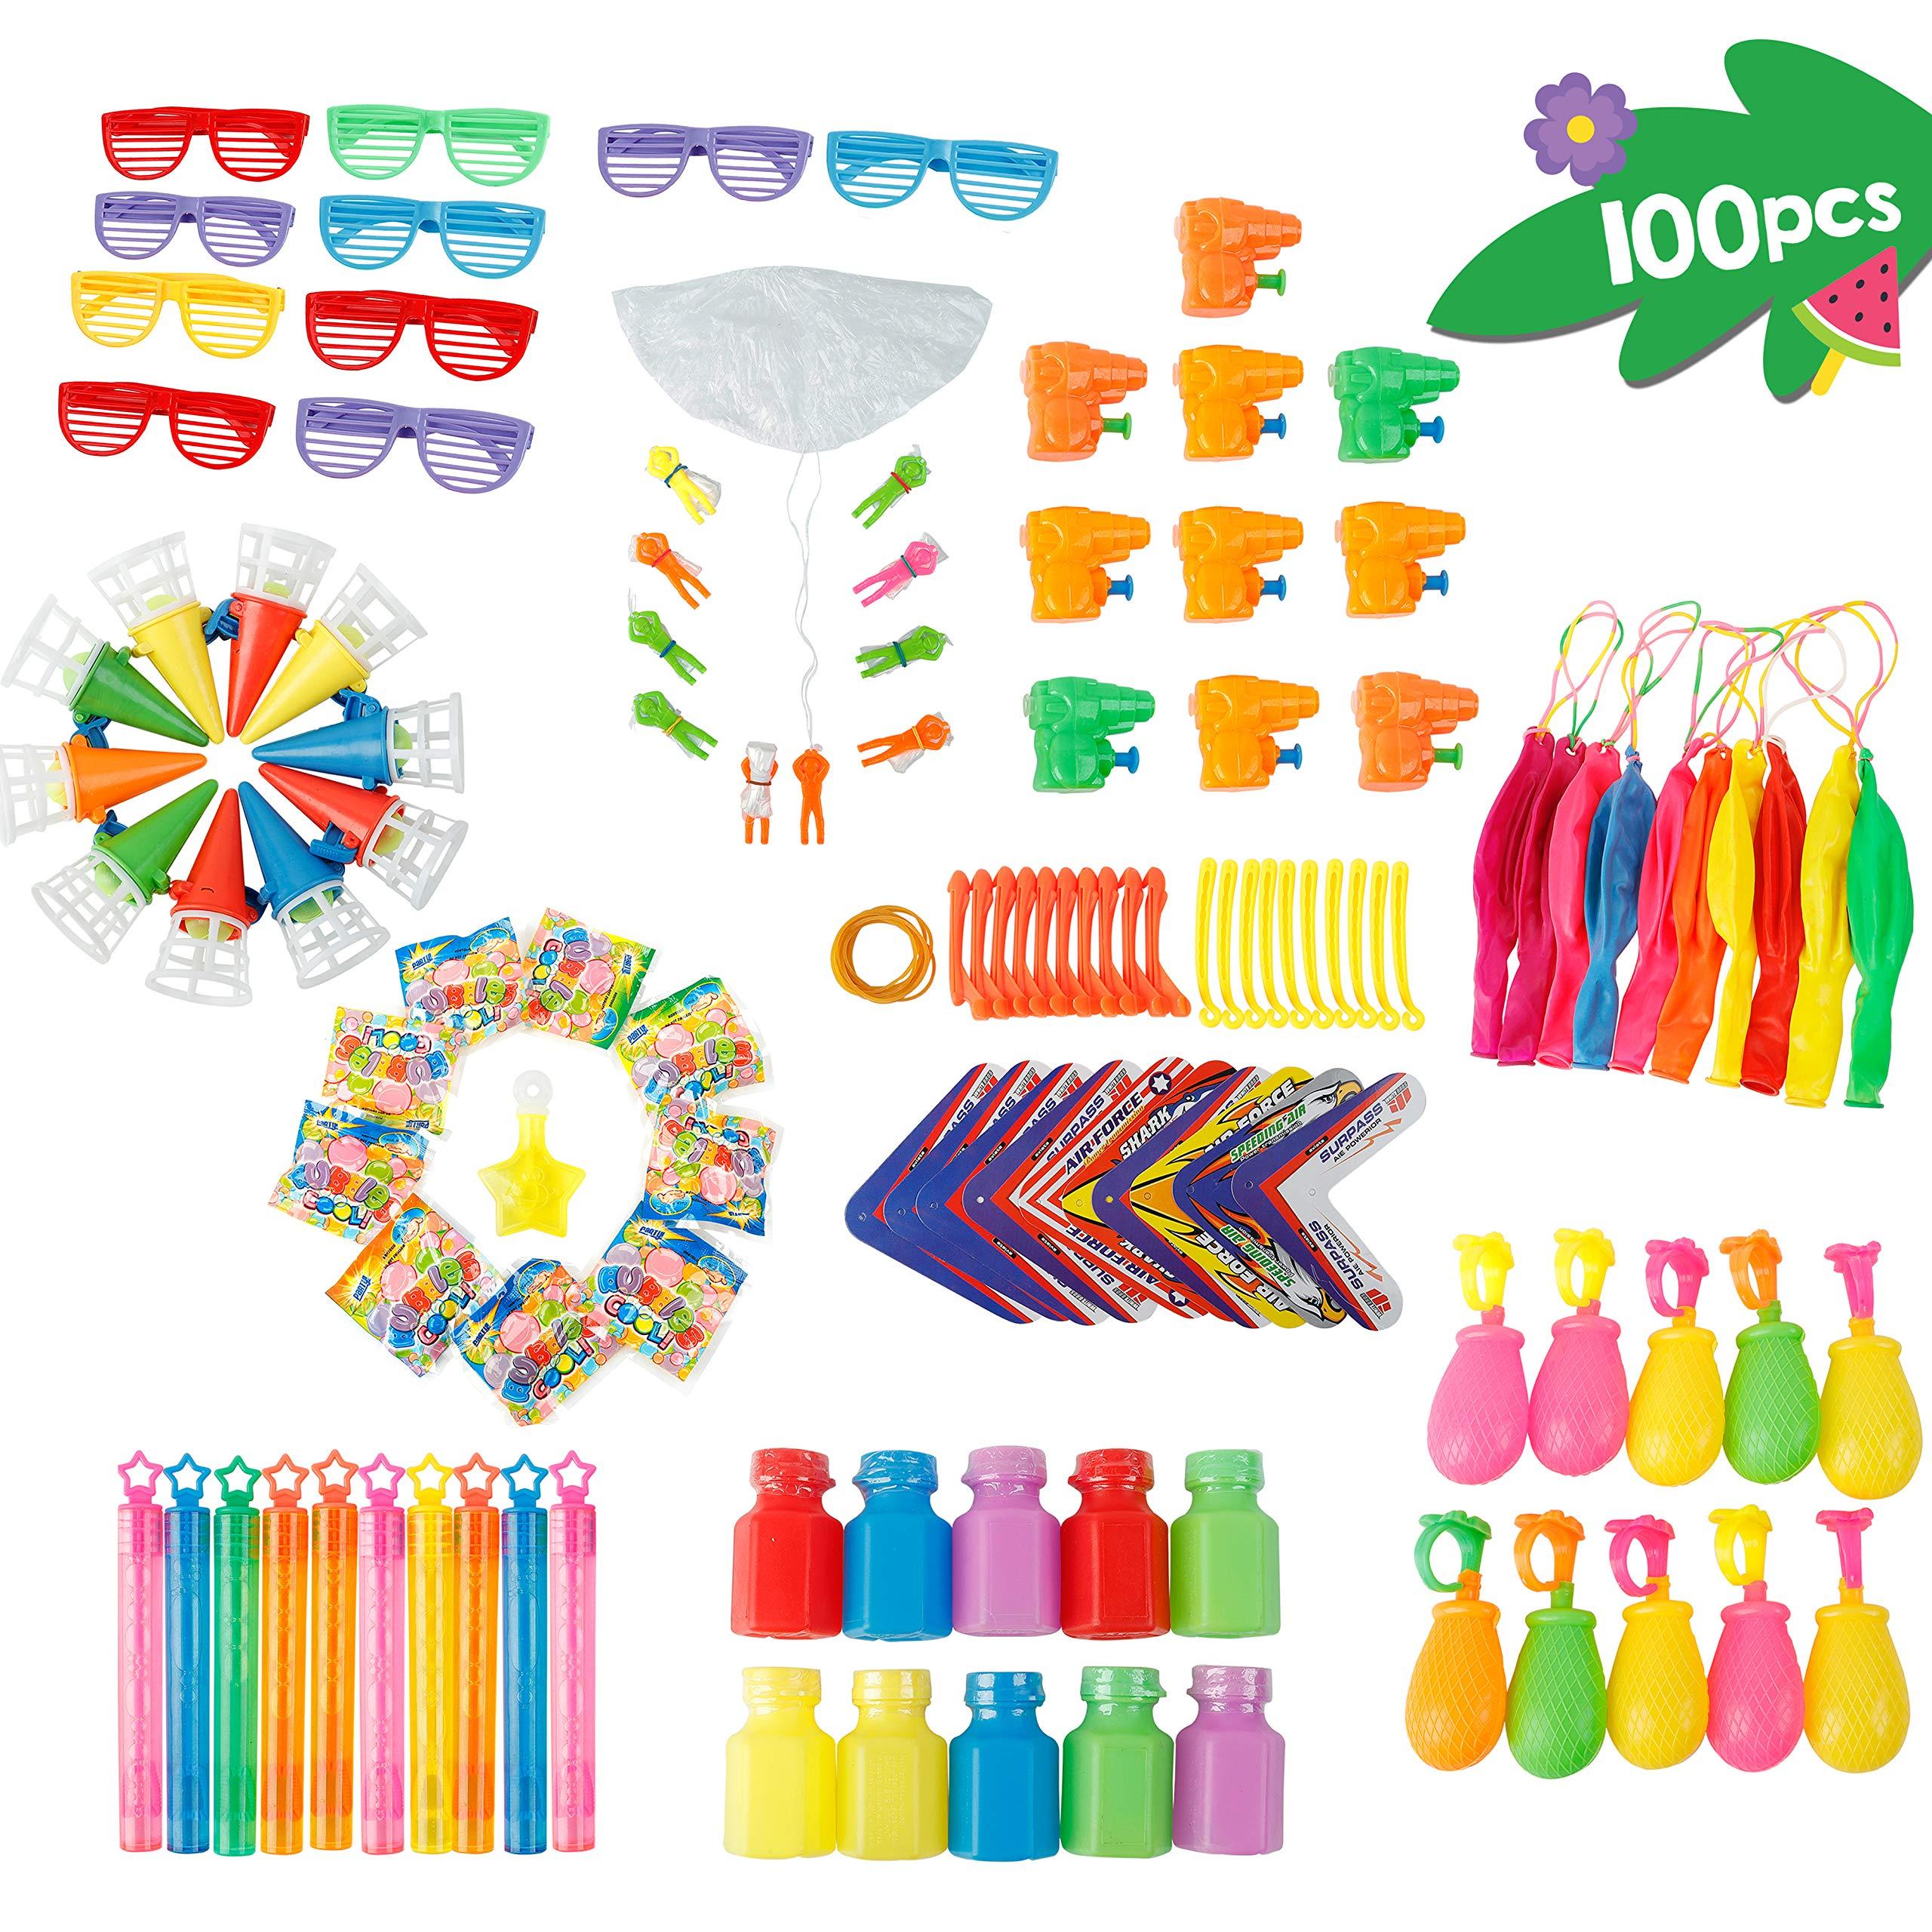 Joyful Toys Beach Party Favors 100Pcs - Summer Fun Toy Pool Party - Fun Beach Toys For Kids | Parachute | Bubble wand | catch bubble | Sunglasses | water guns | Punch balloon | shooter plane | bubble bottle